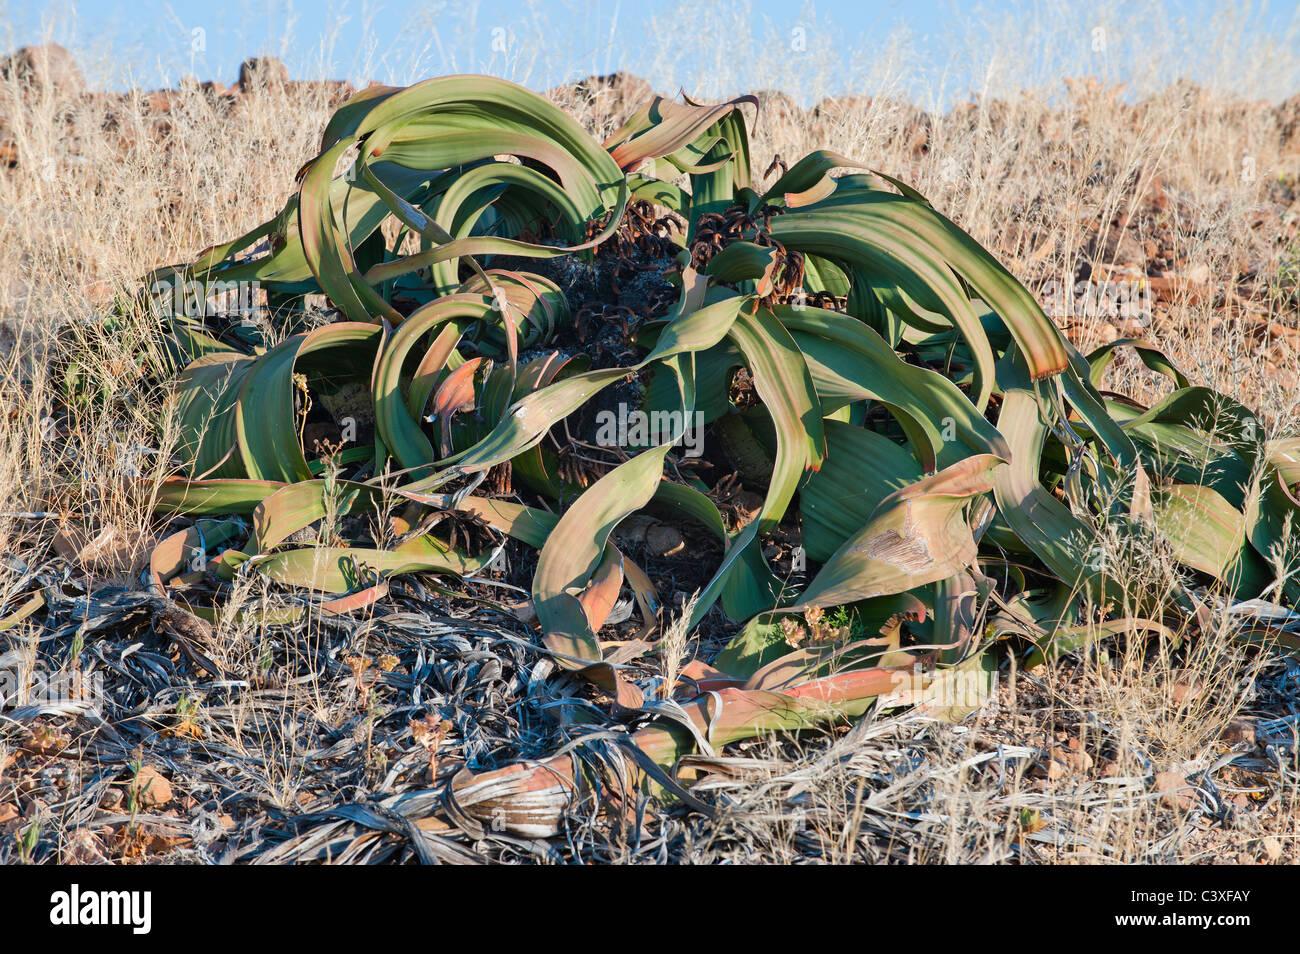 welwitsch Velvicia Velvichia mirabilis plant Namibia desert missing link between gymnosperms and angiosperms exotic - Stock Image